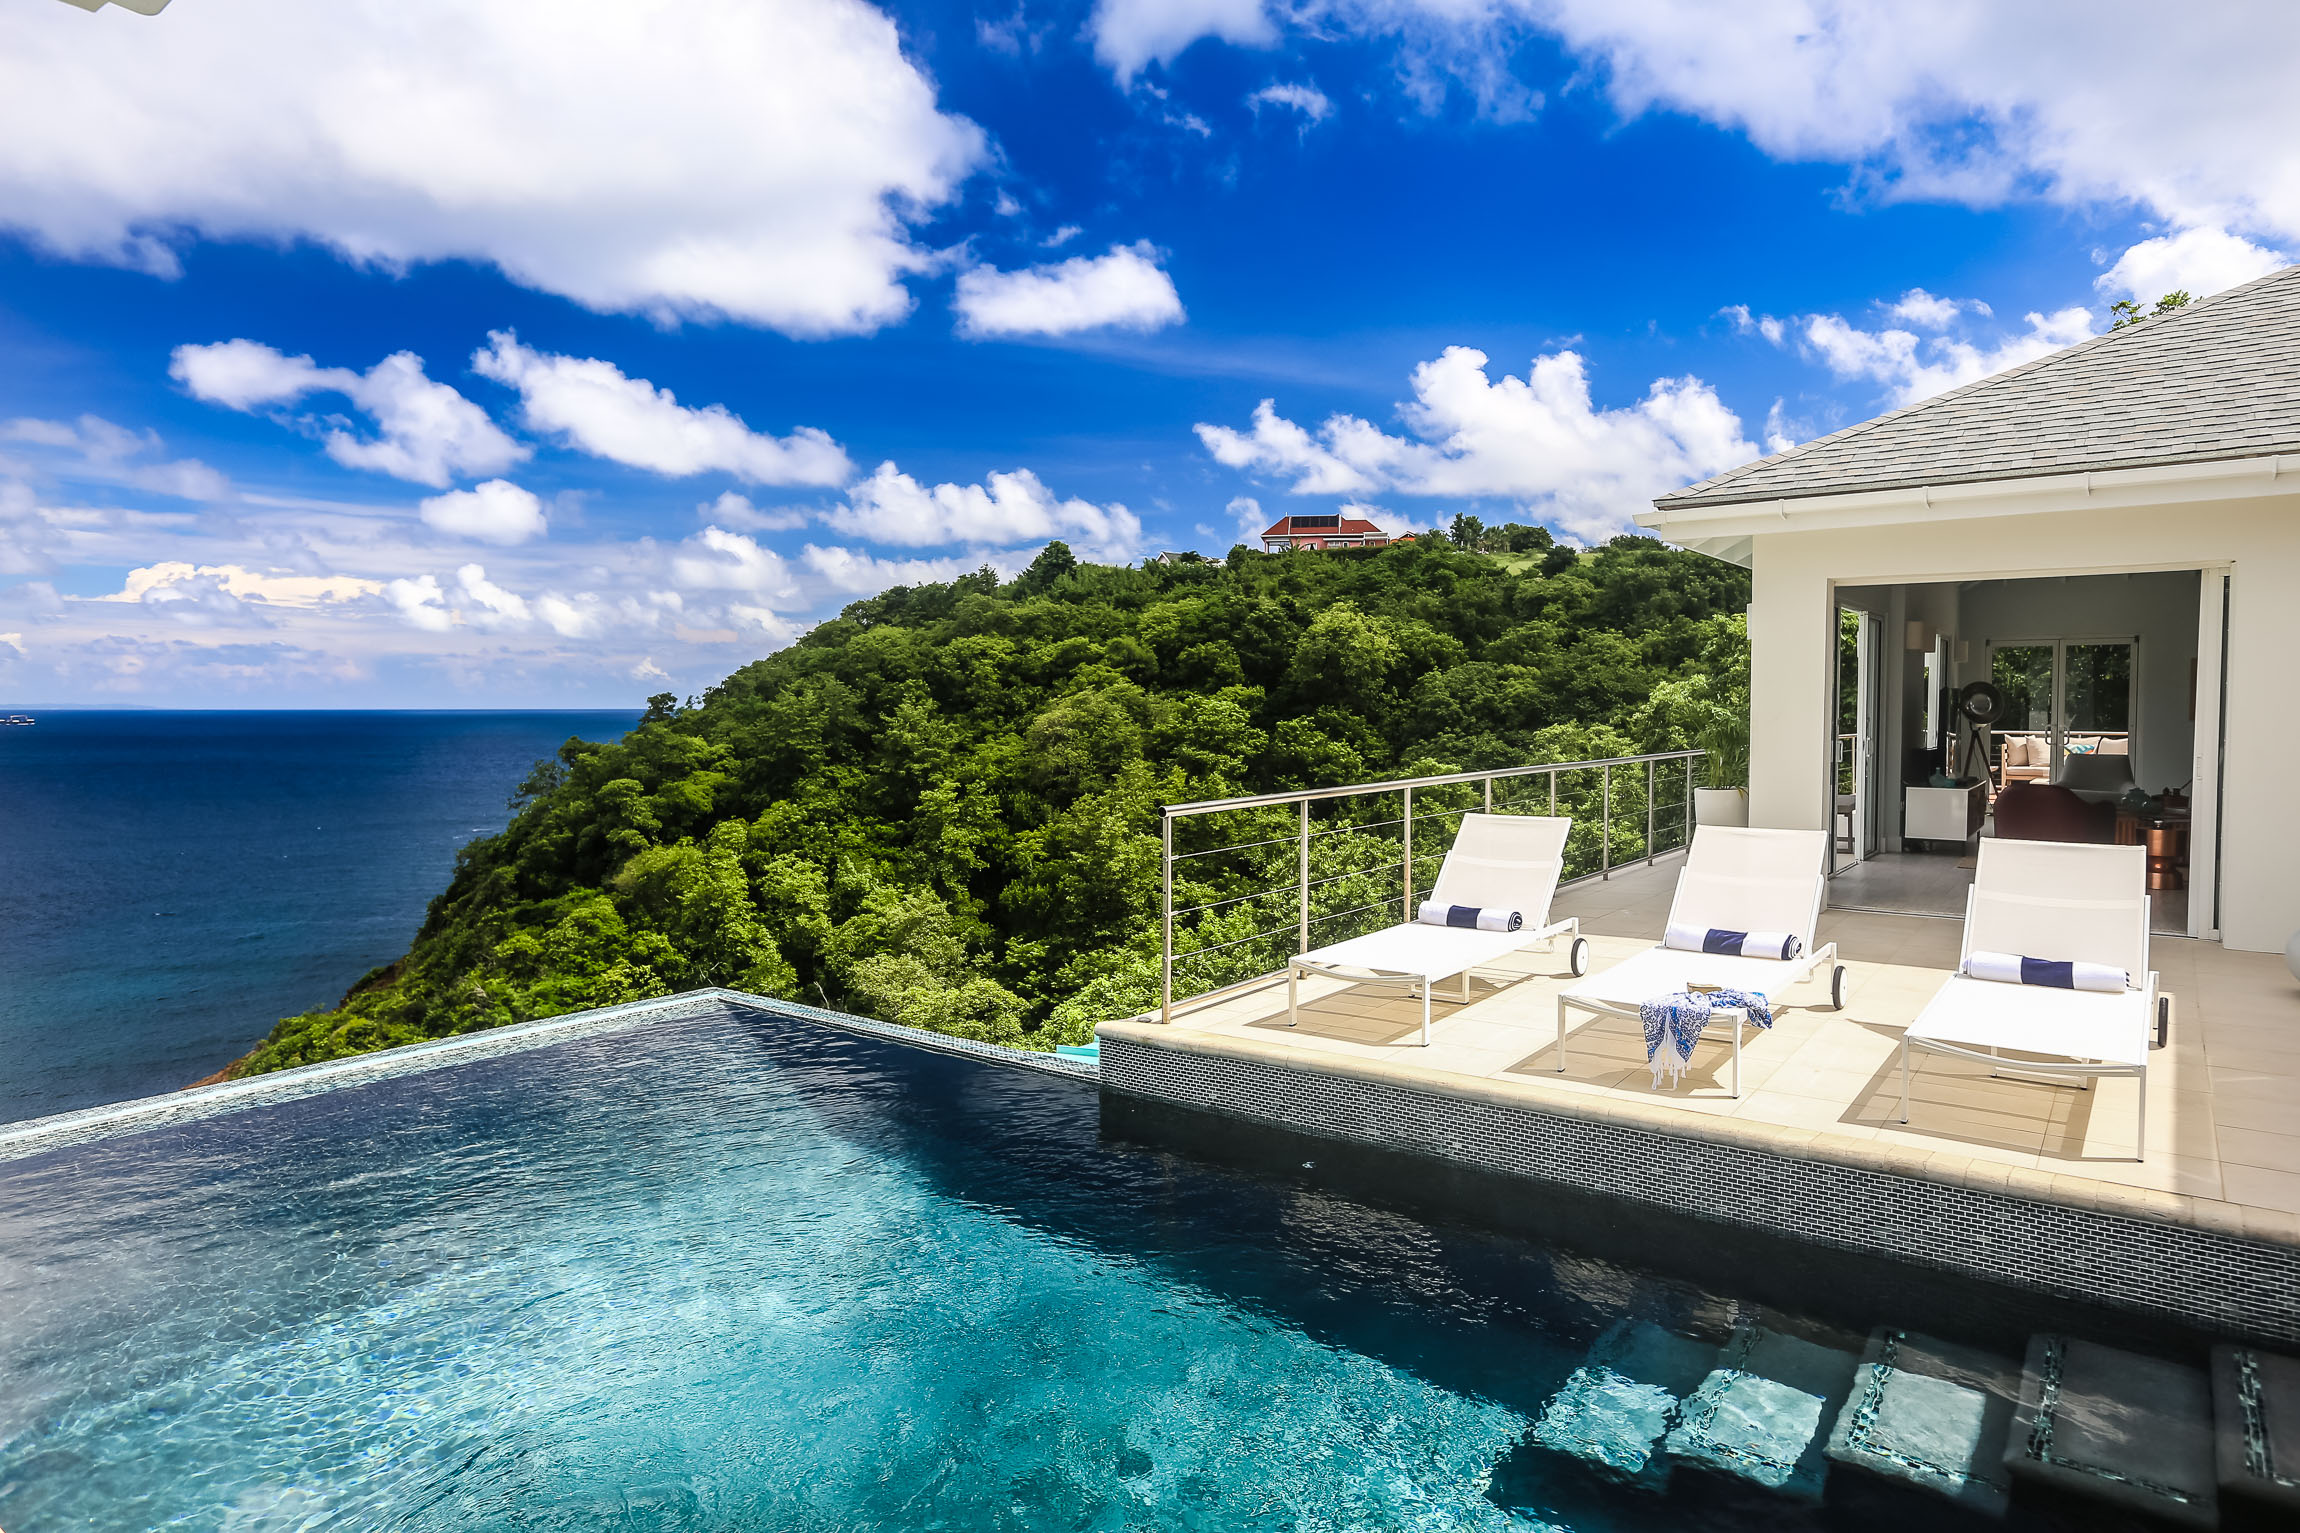 Xhale Luxury Villa - Cap Estate, Gros Islet, St. Lucia